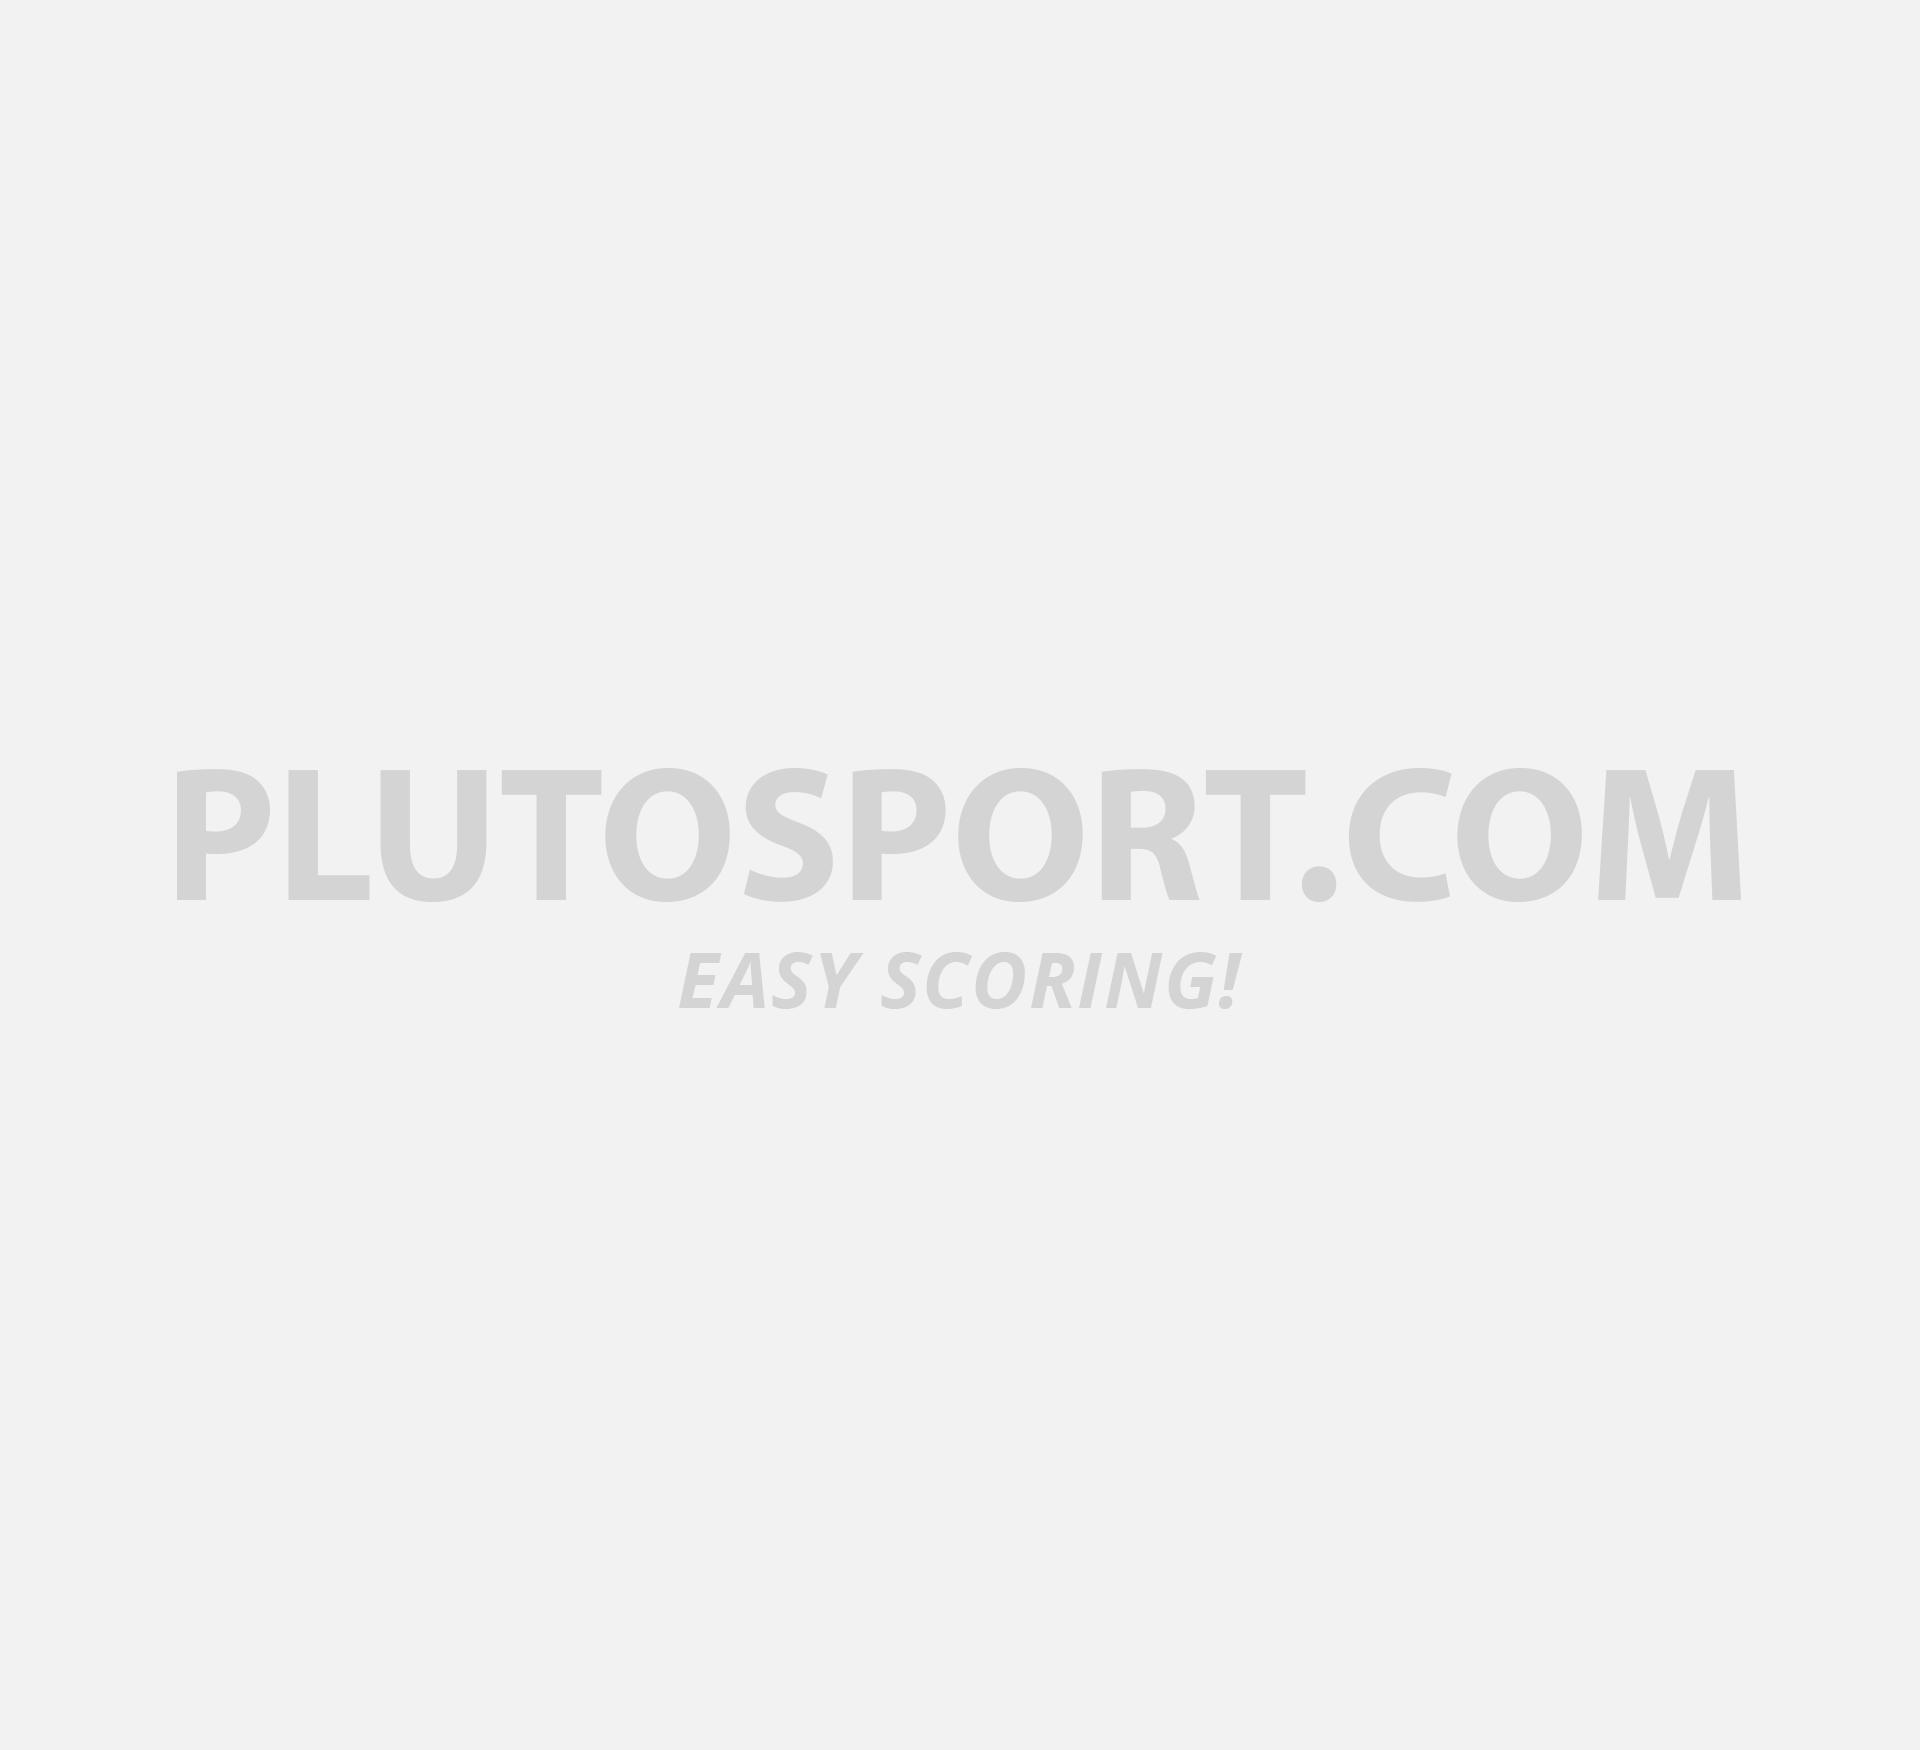 263a54c9b3e Reebok Freestyle Hi Int Sneaker Wms - Sneakers - Shoes - Lifestyle - Sports  | Plutosport